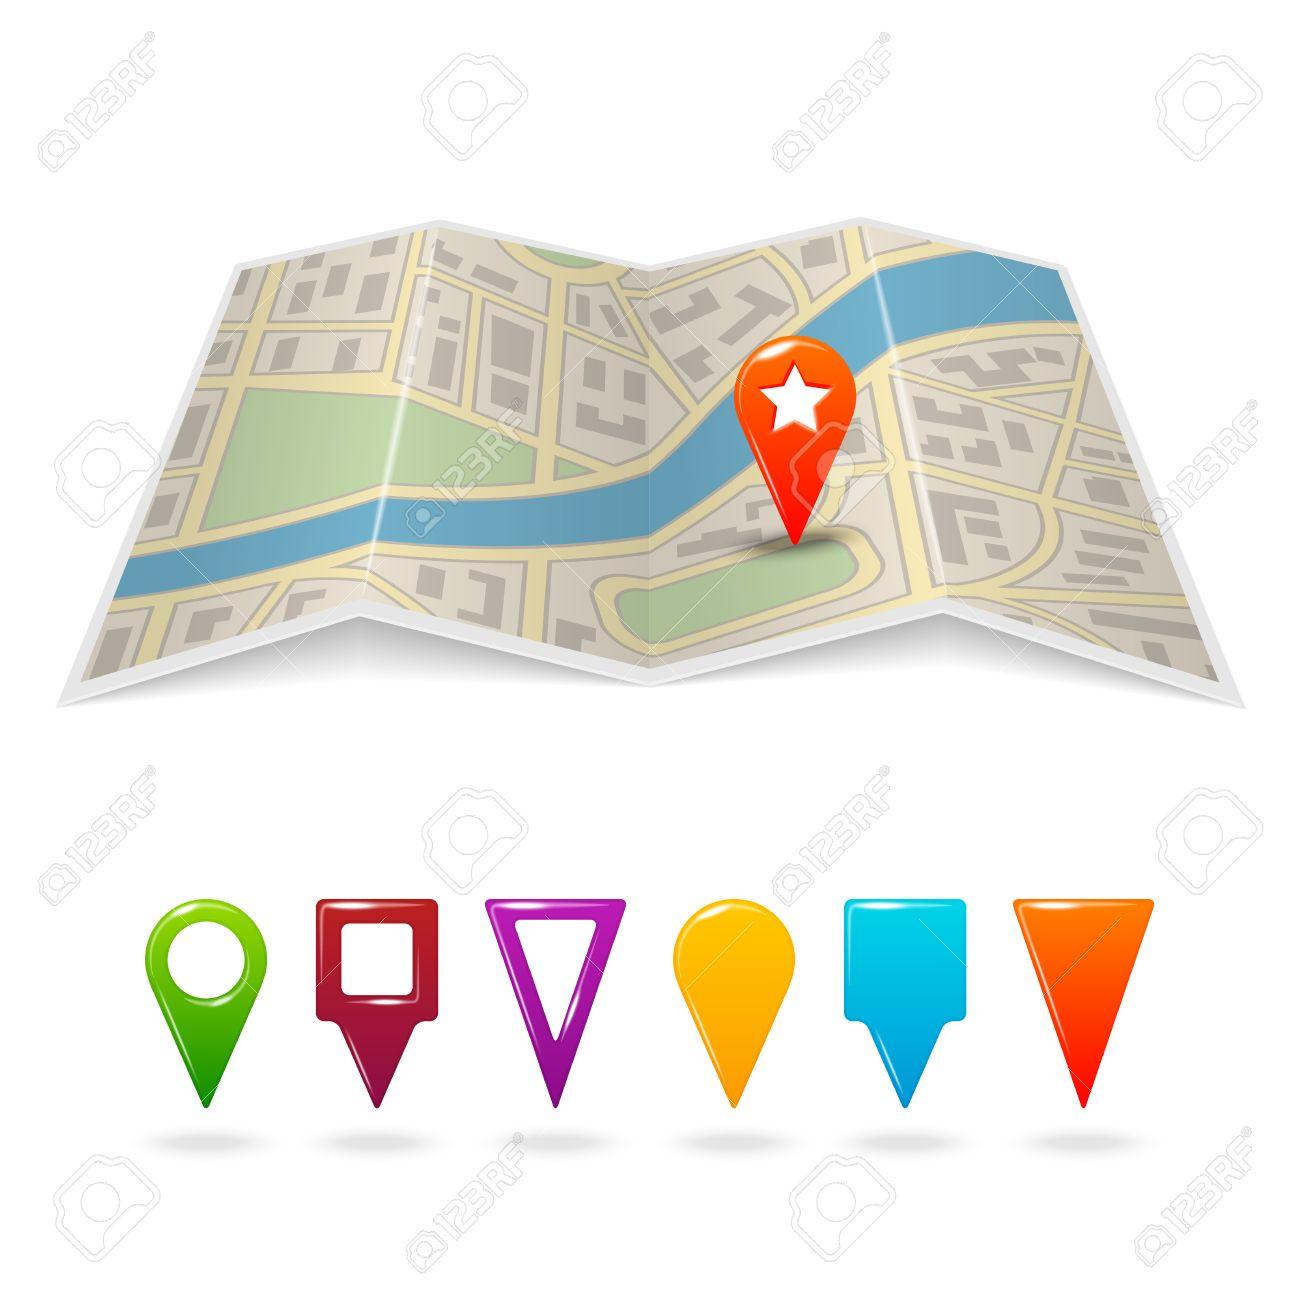 Travel City Road Street Map With Navigation Pin Symbols Vector – Road Navigation Map